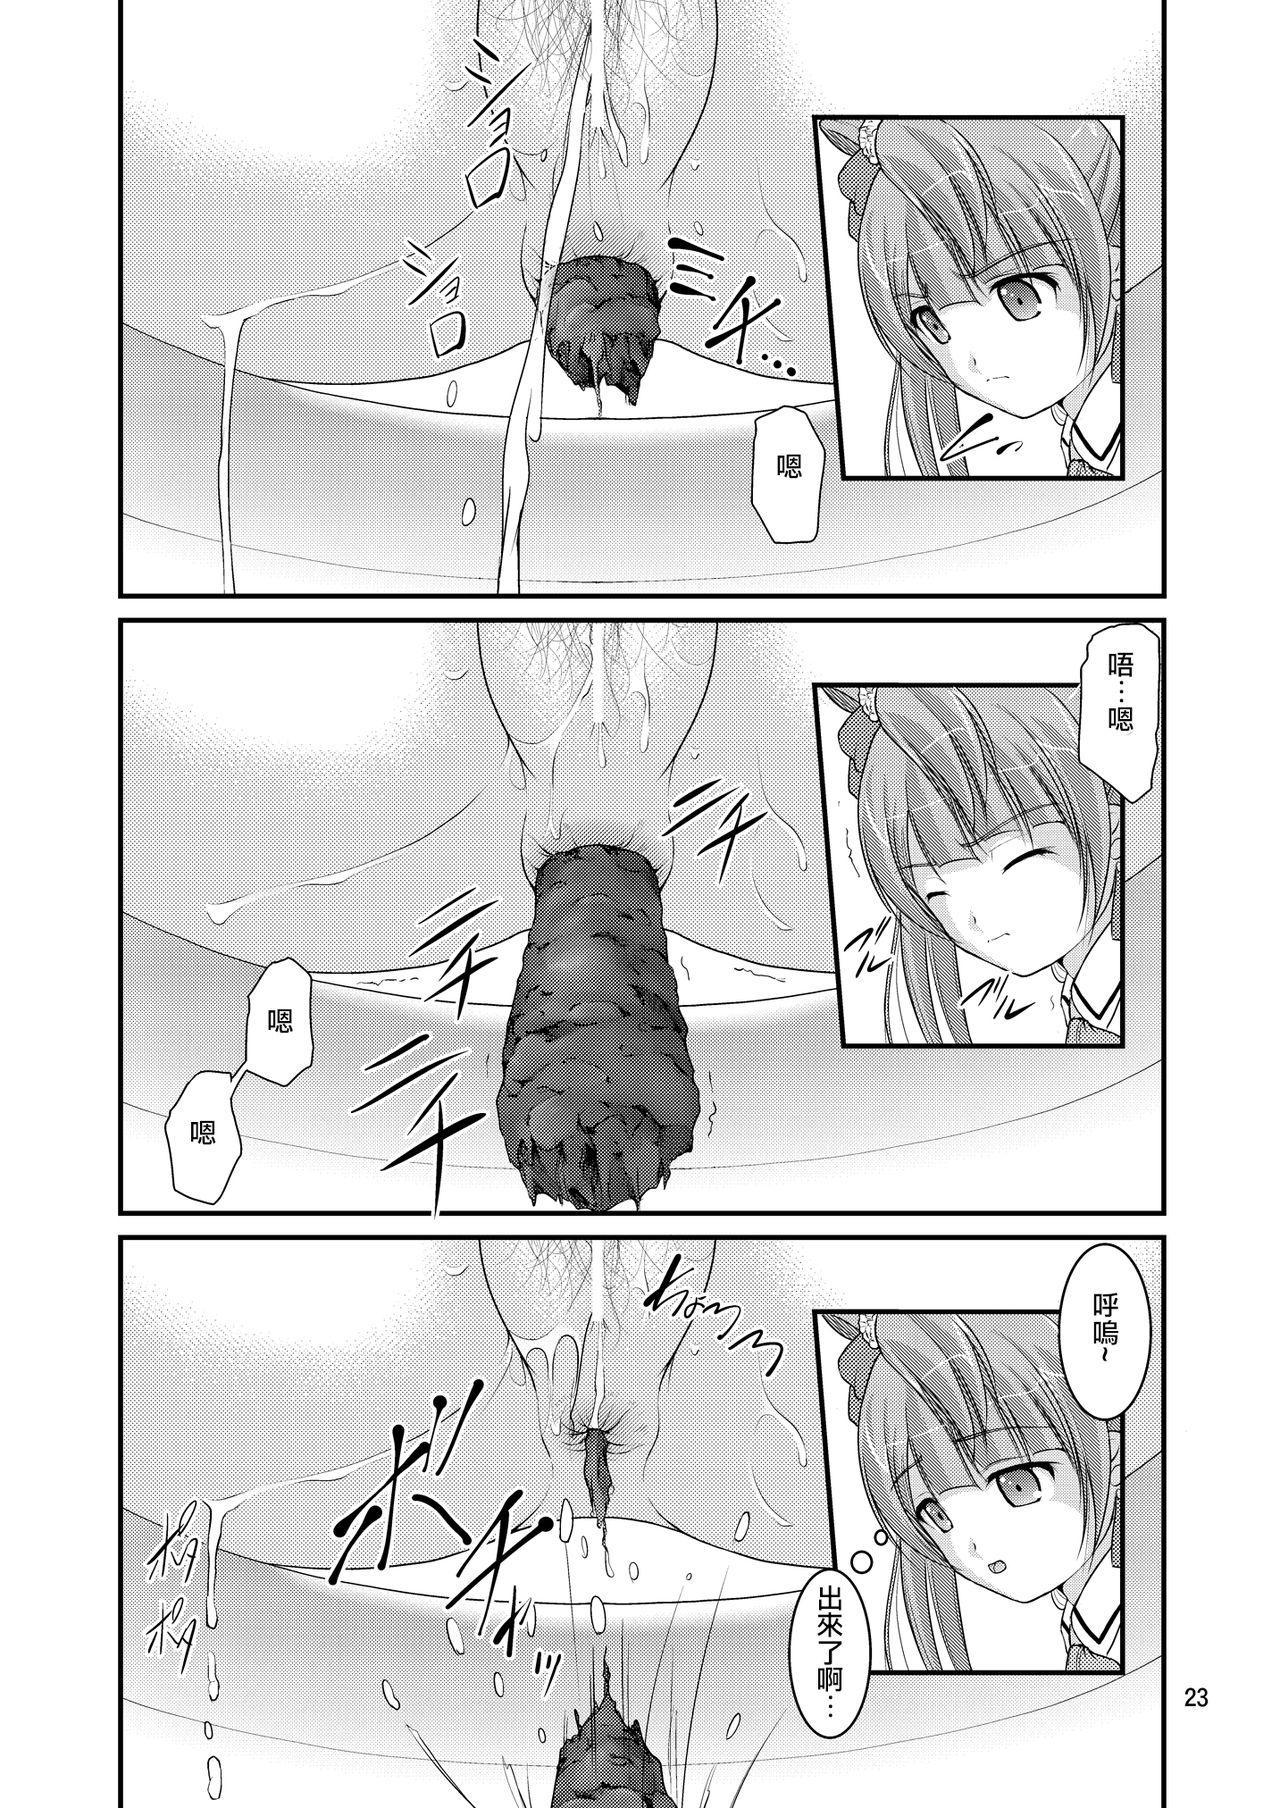 Bou Ninki School Idol Toilet Tousatsu vol. 1   某人氣學園偶像 廁所盜攝 Vol. 1 20